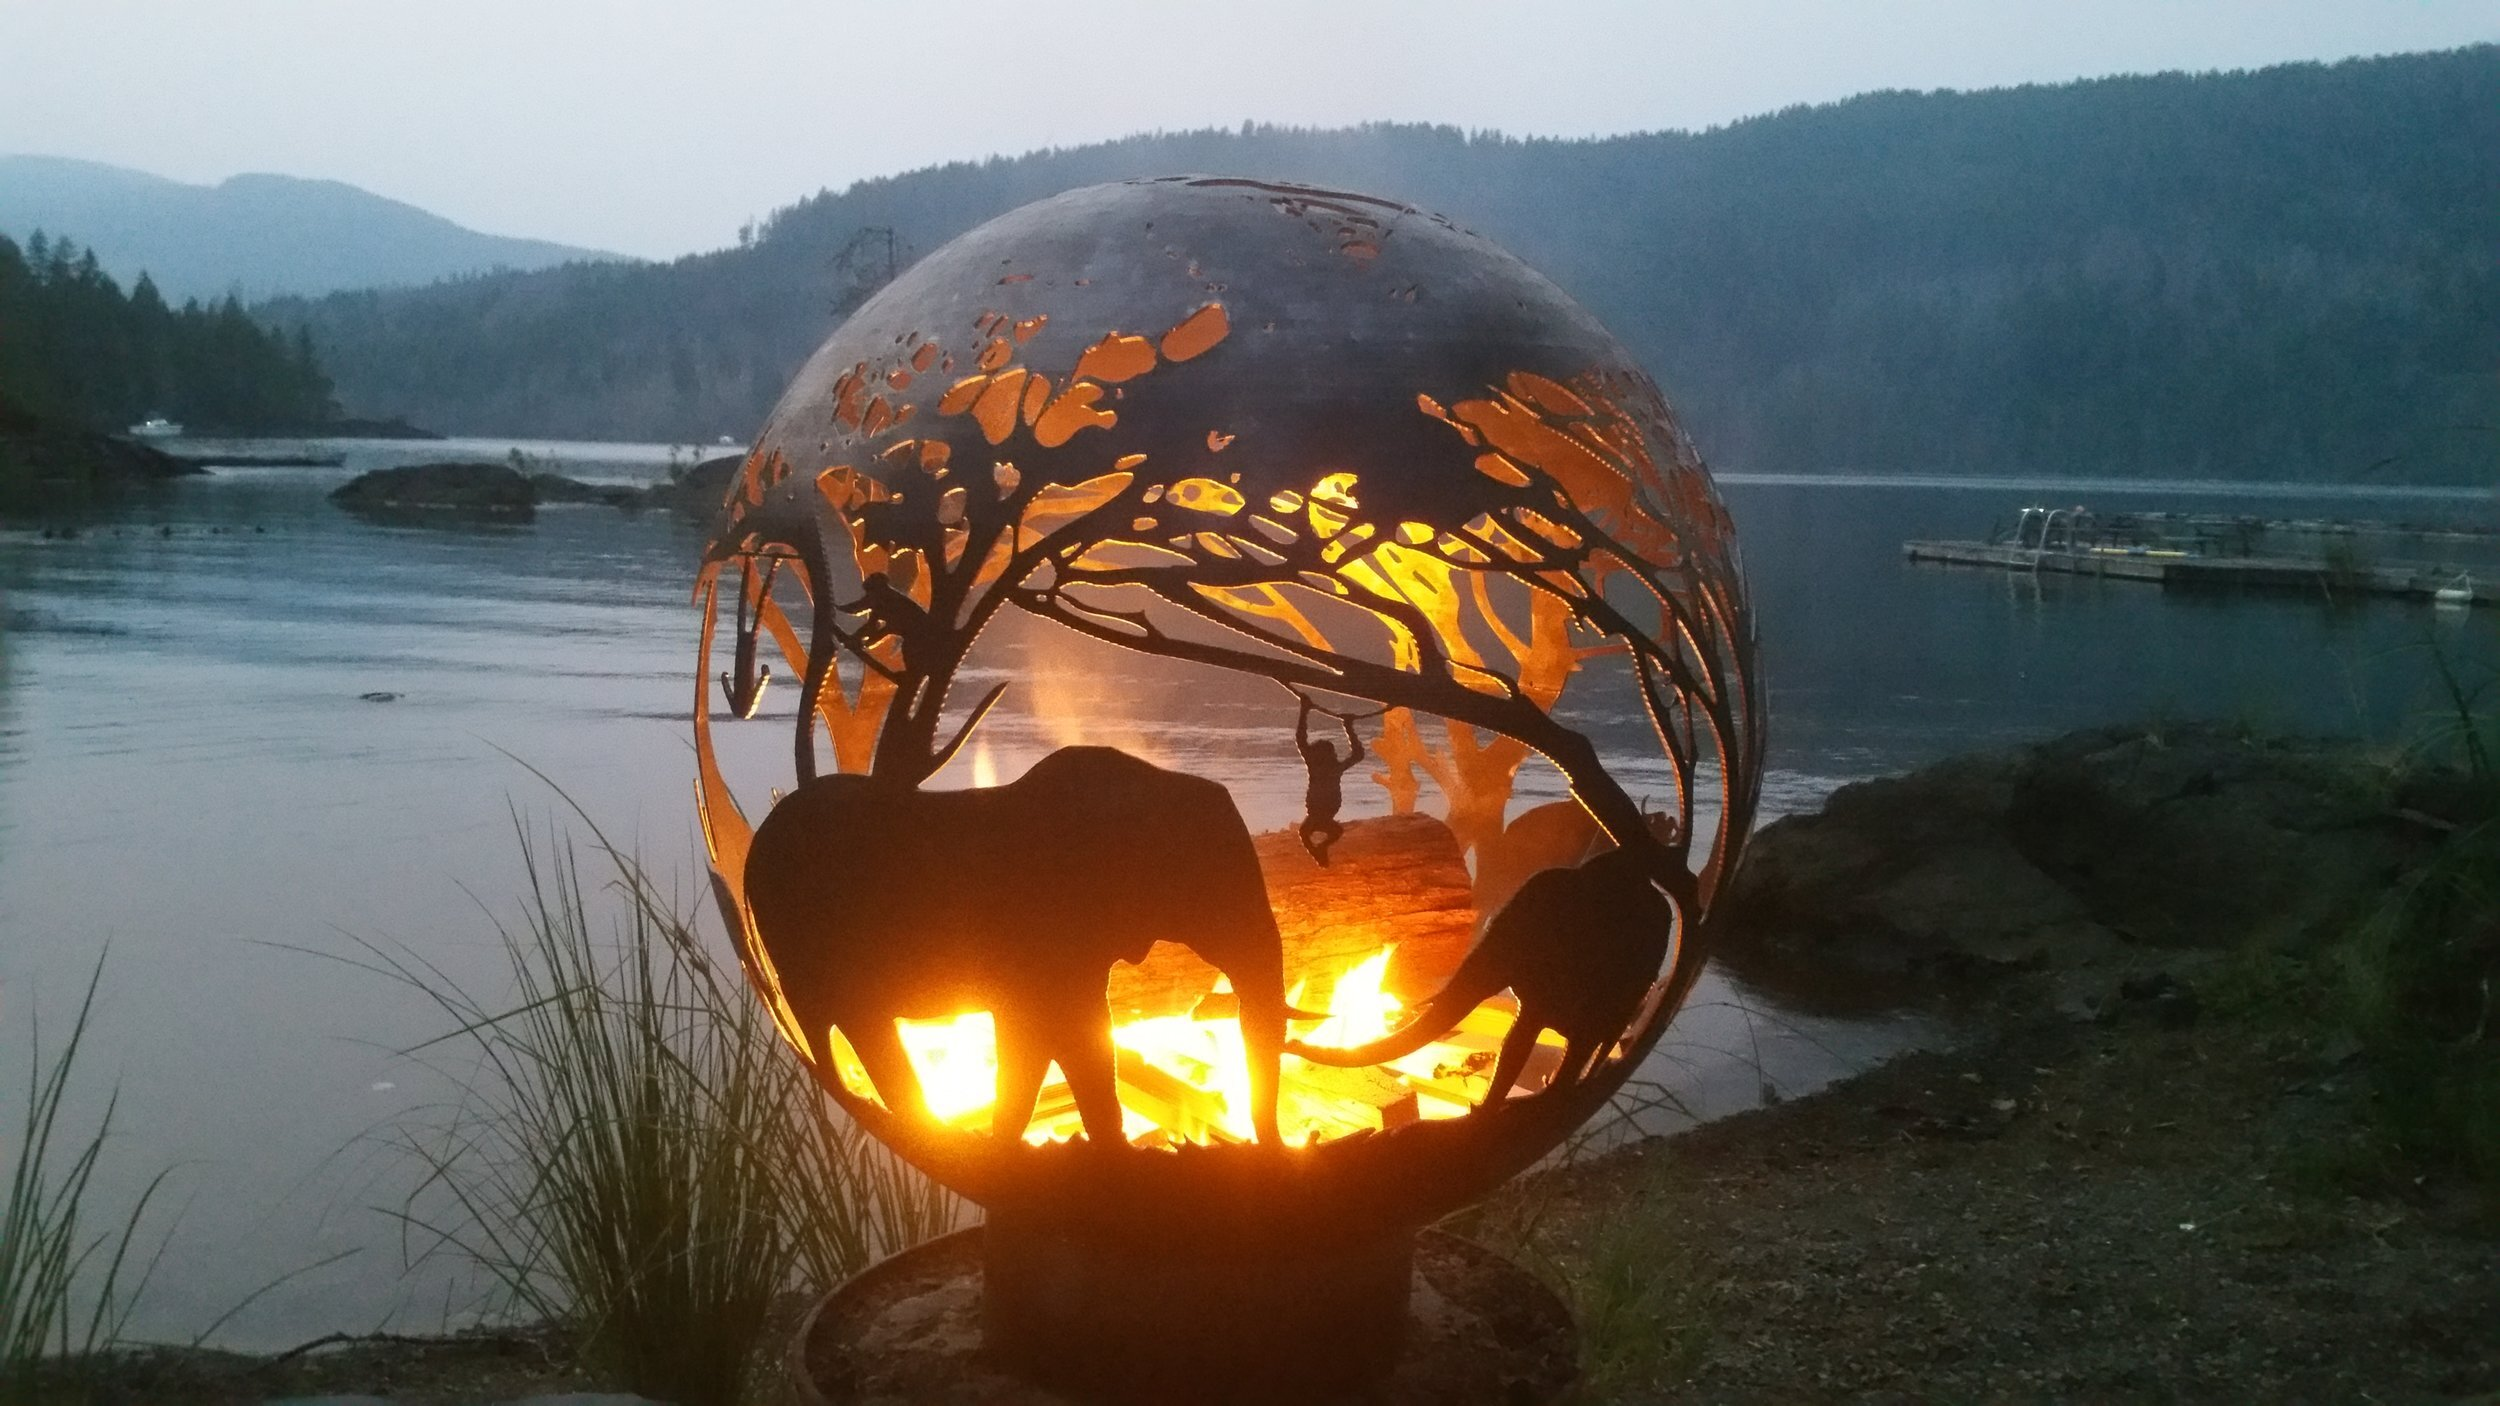 "Savannah Inspired Fire Pit (37"" Black Ceramic Coating)"